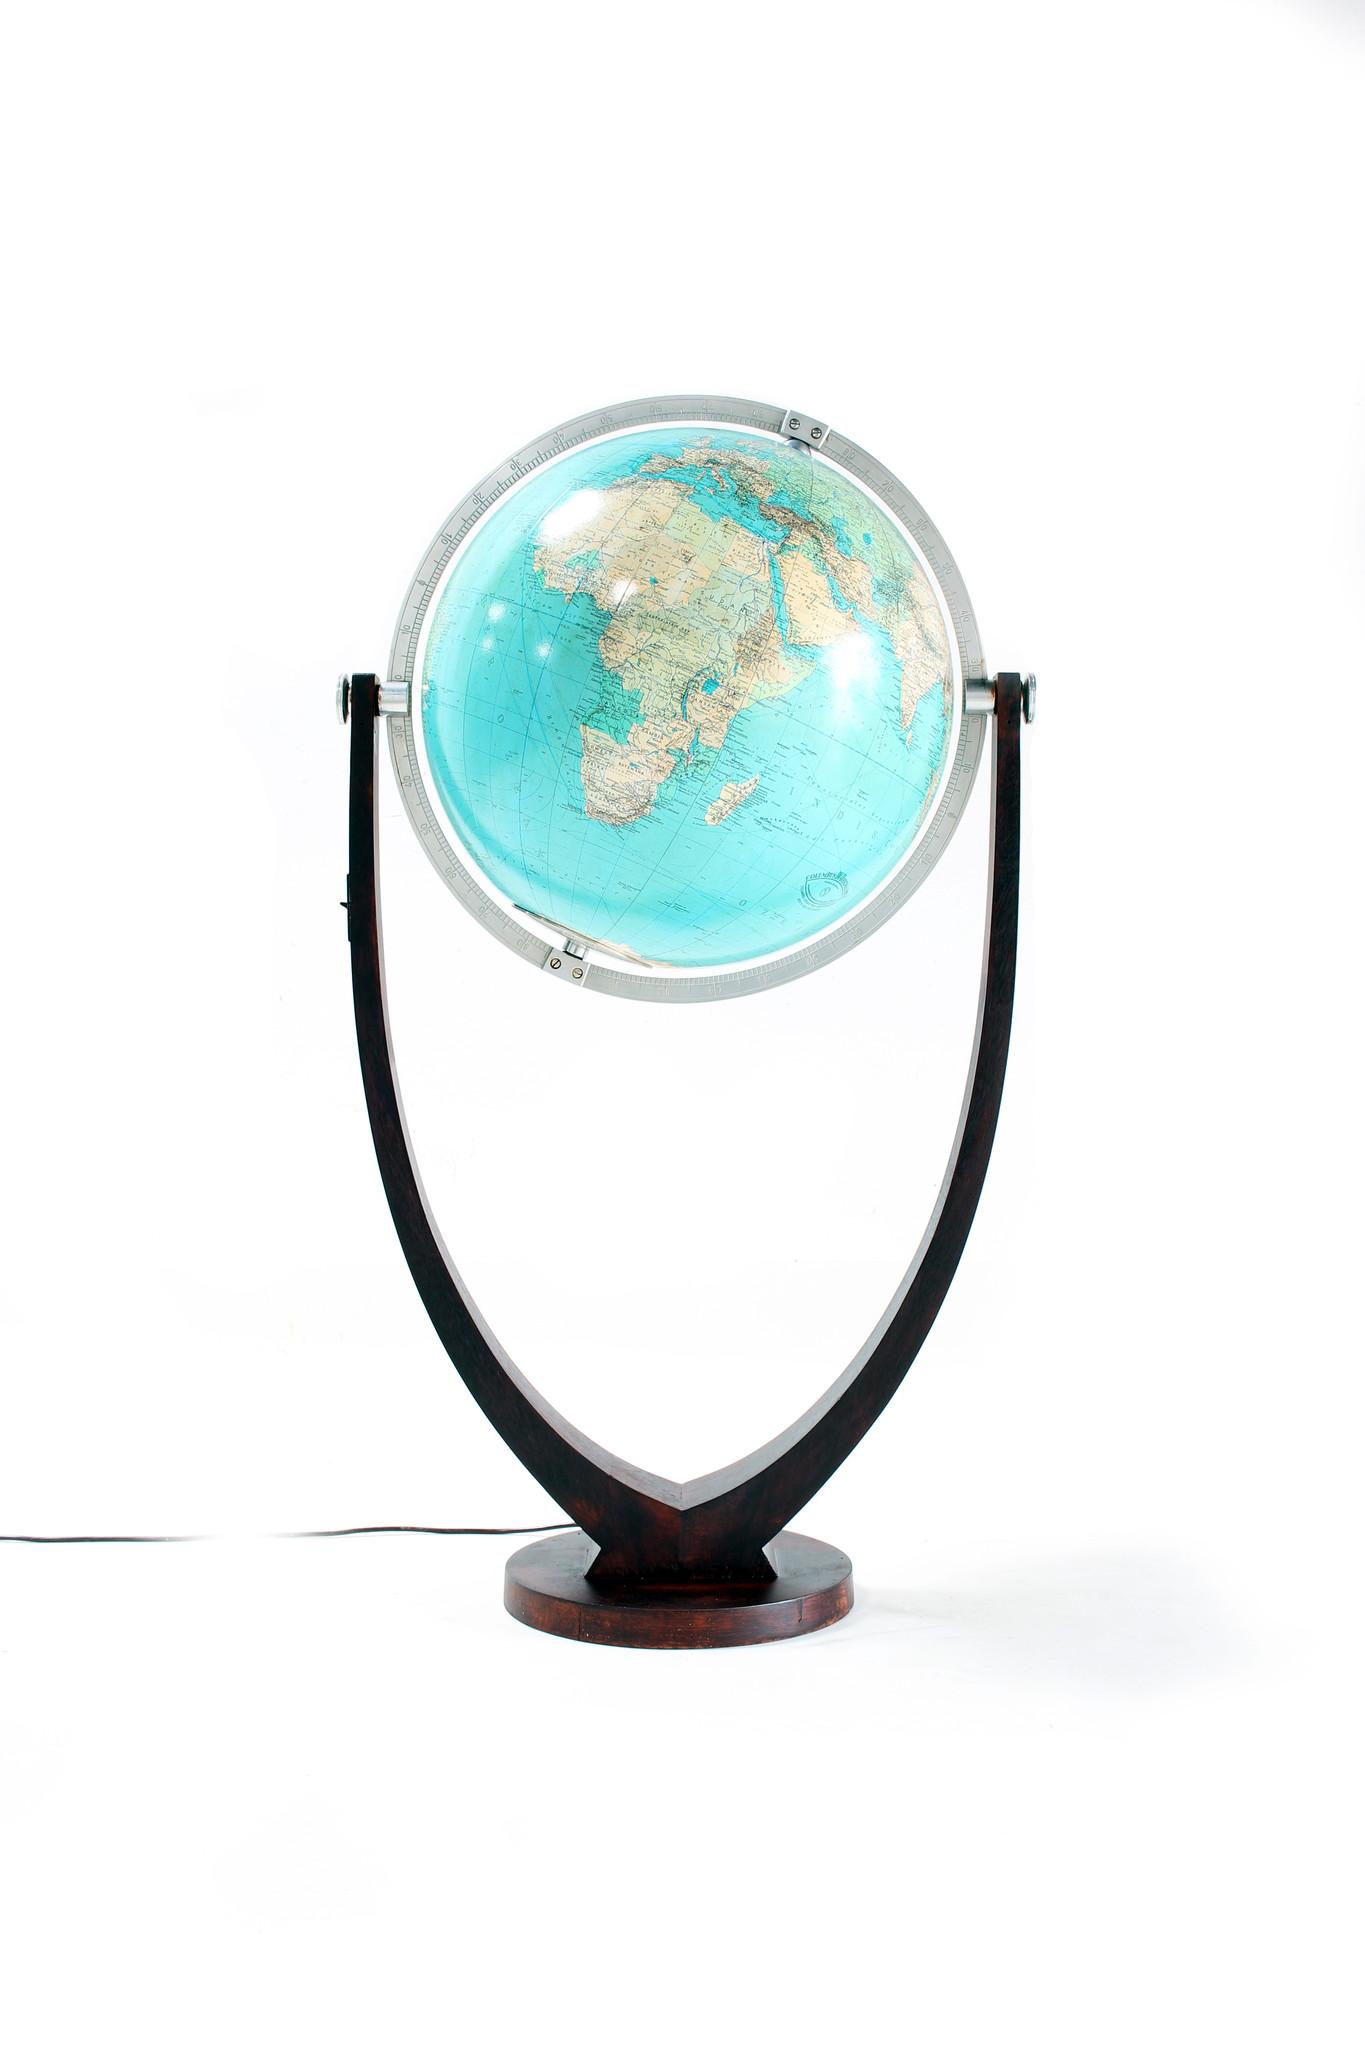 Columbus Globe designed by Paul Oestergaard, 1950s